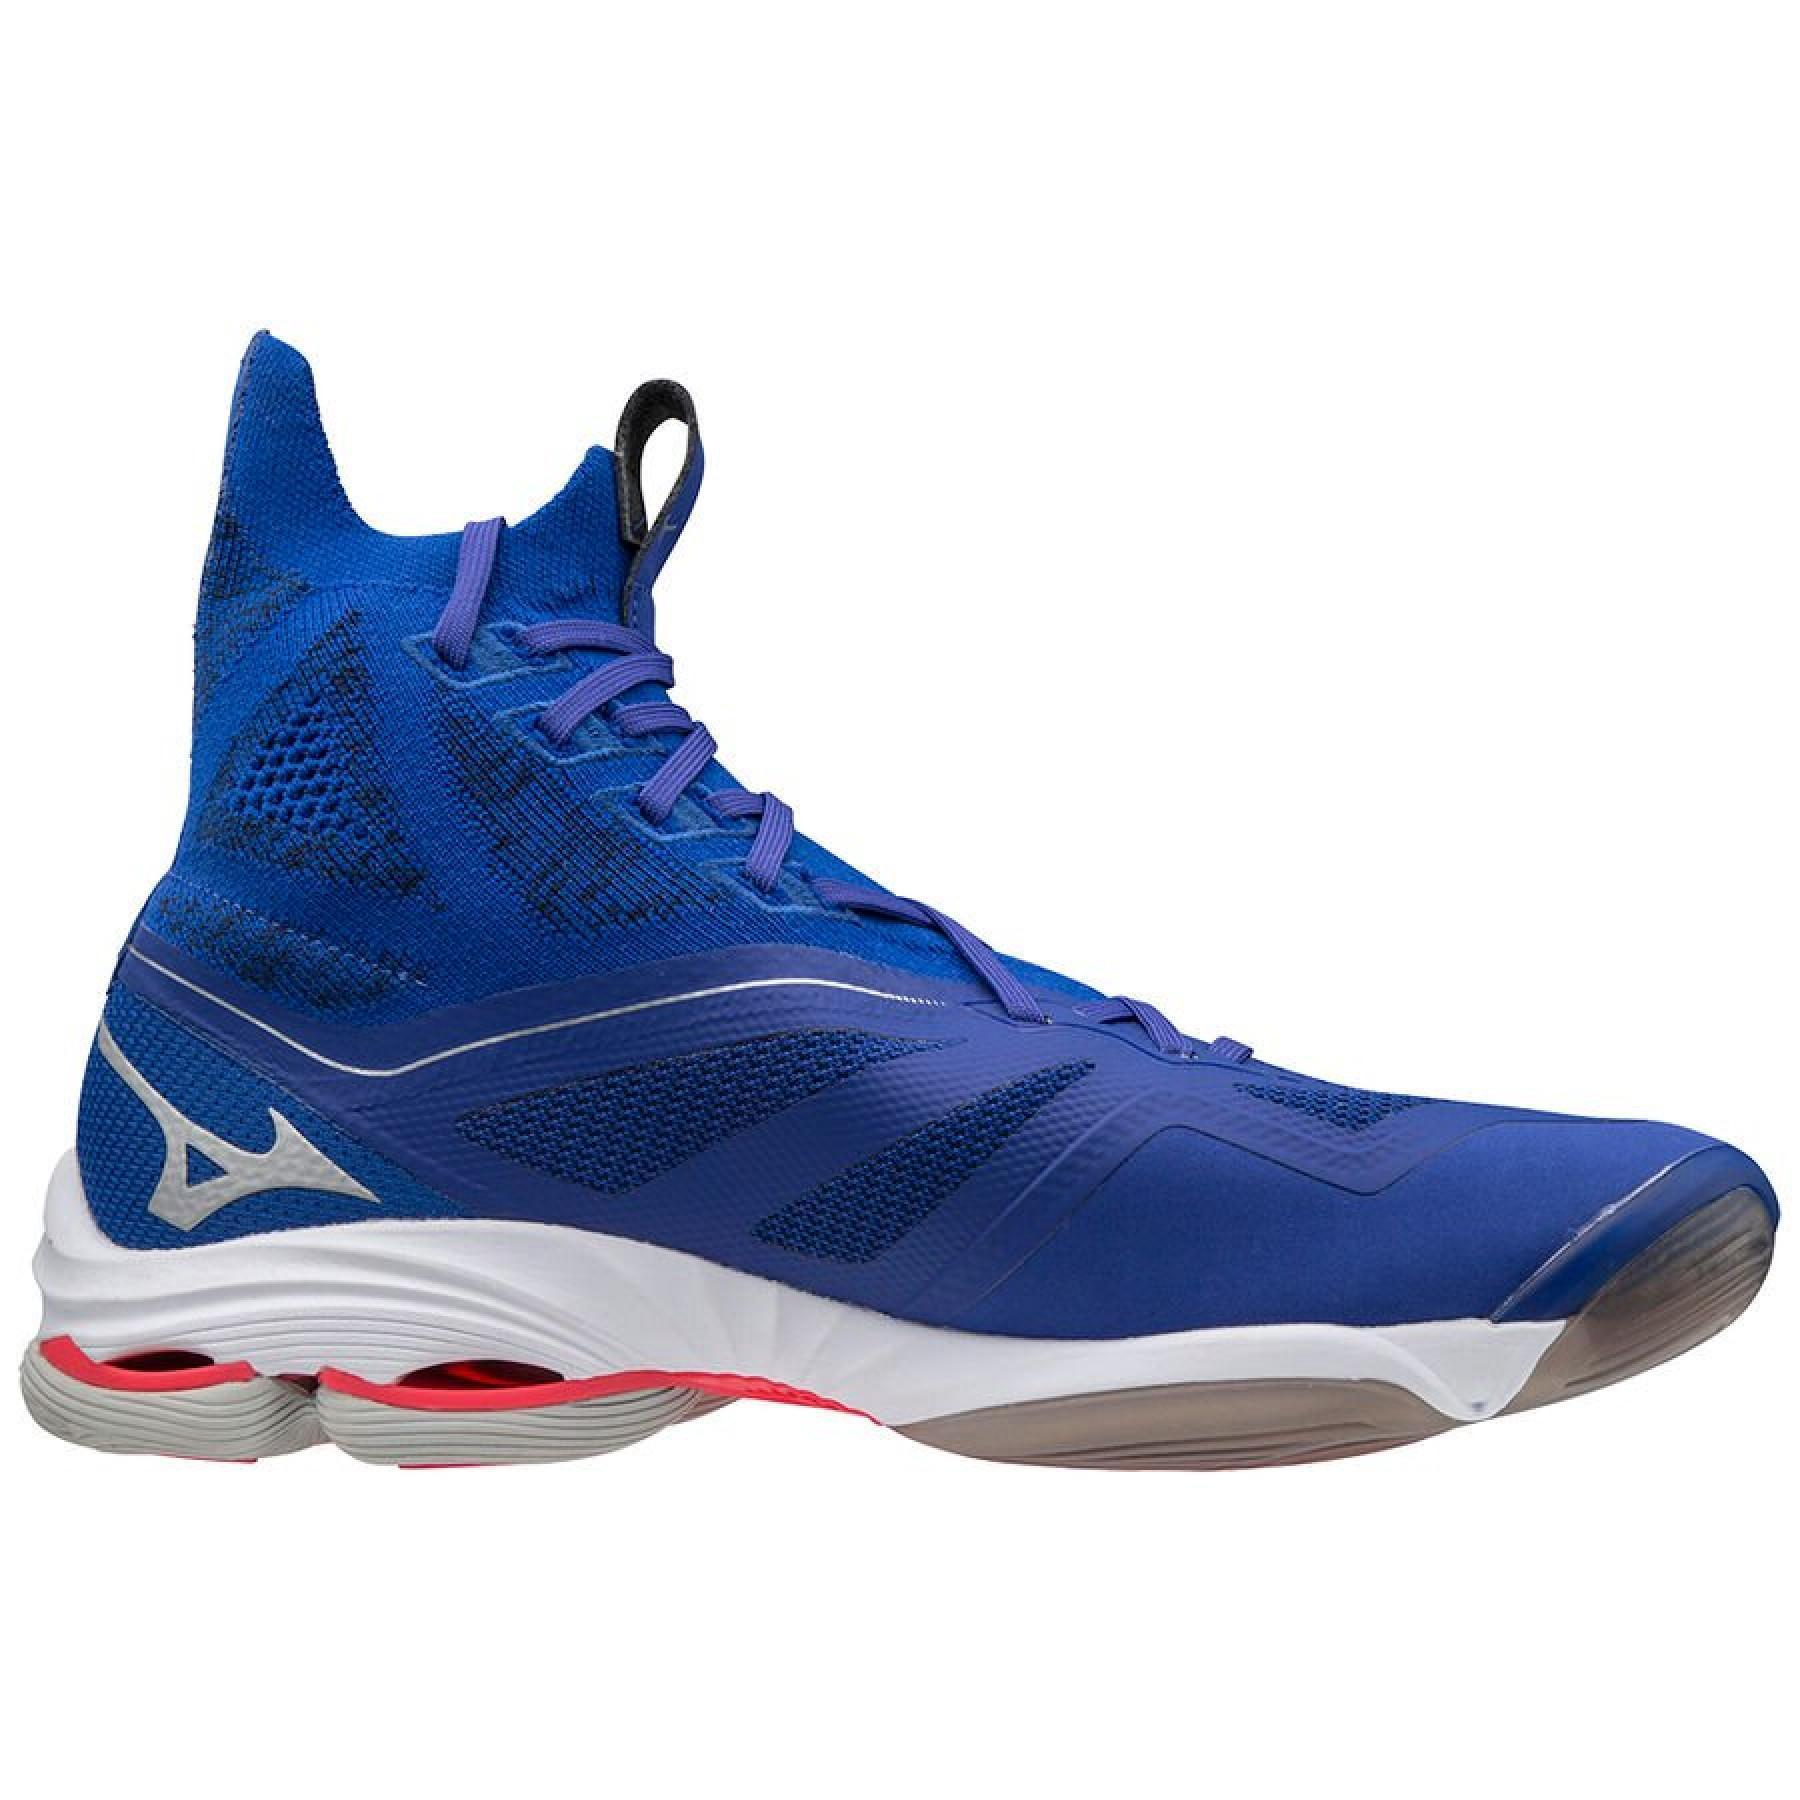 Mizuno Lightning Neo Chaussure de Volleyball Homme